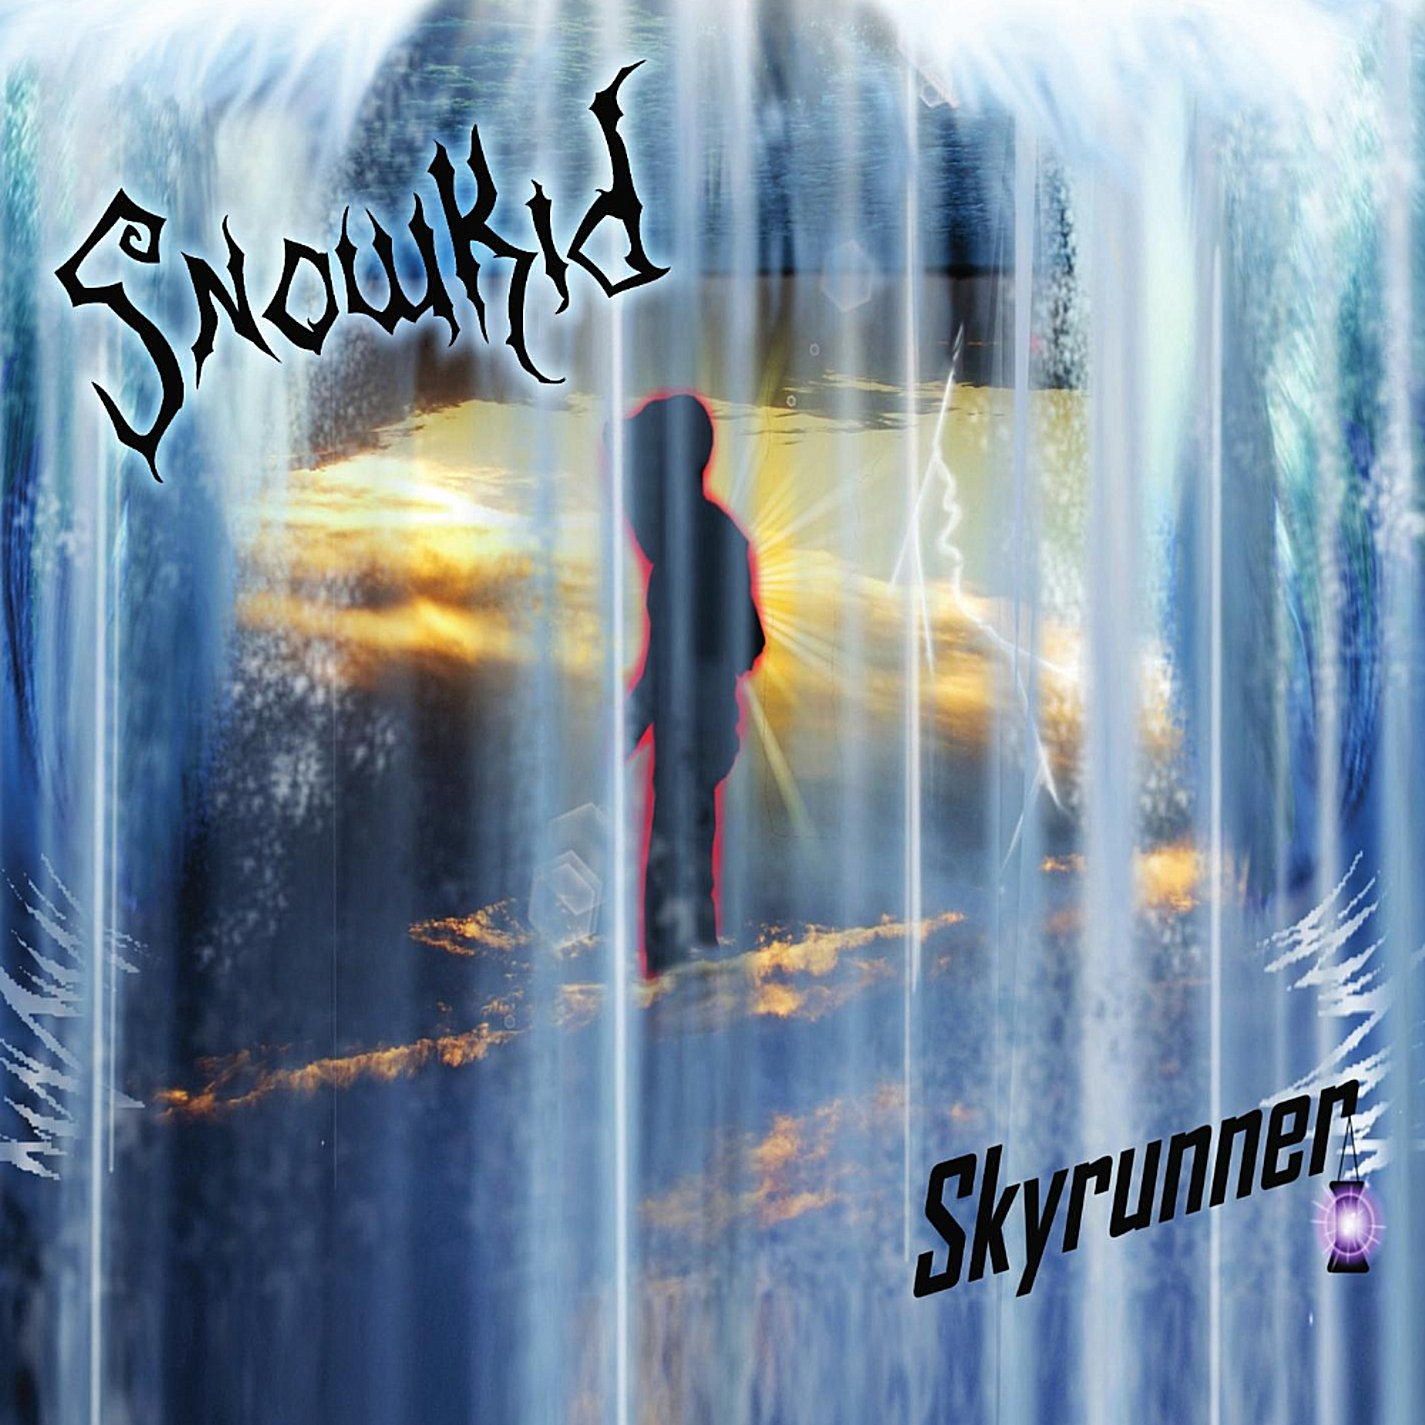 Skyrunner [Explicit] Explicit Lyrics